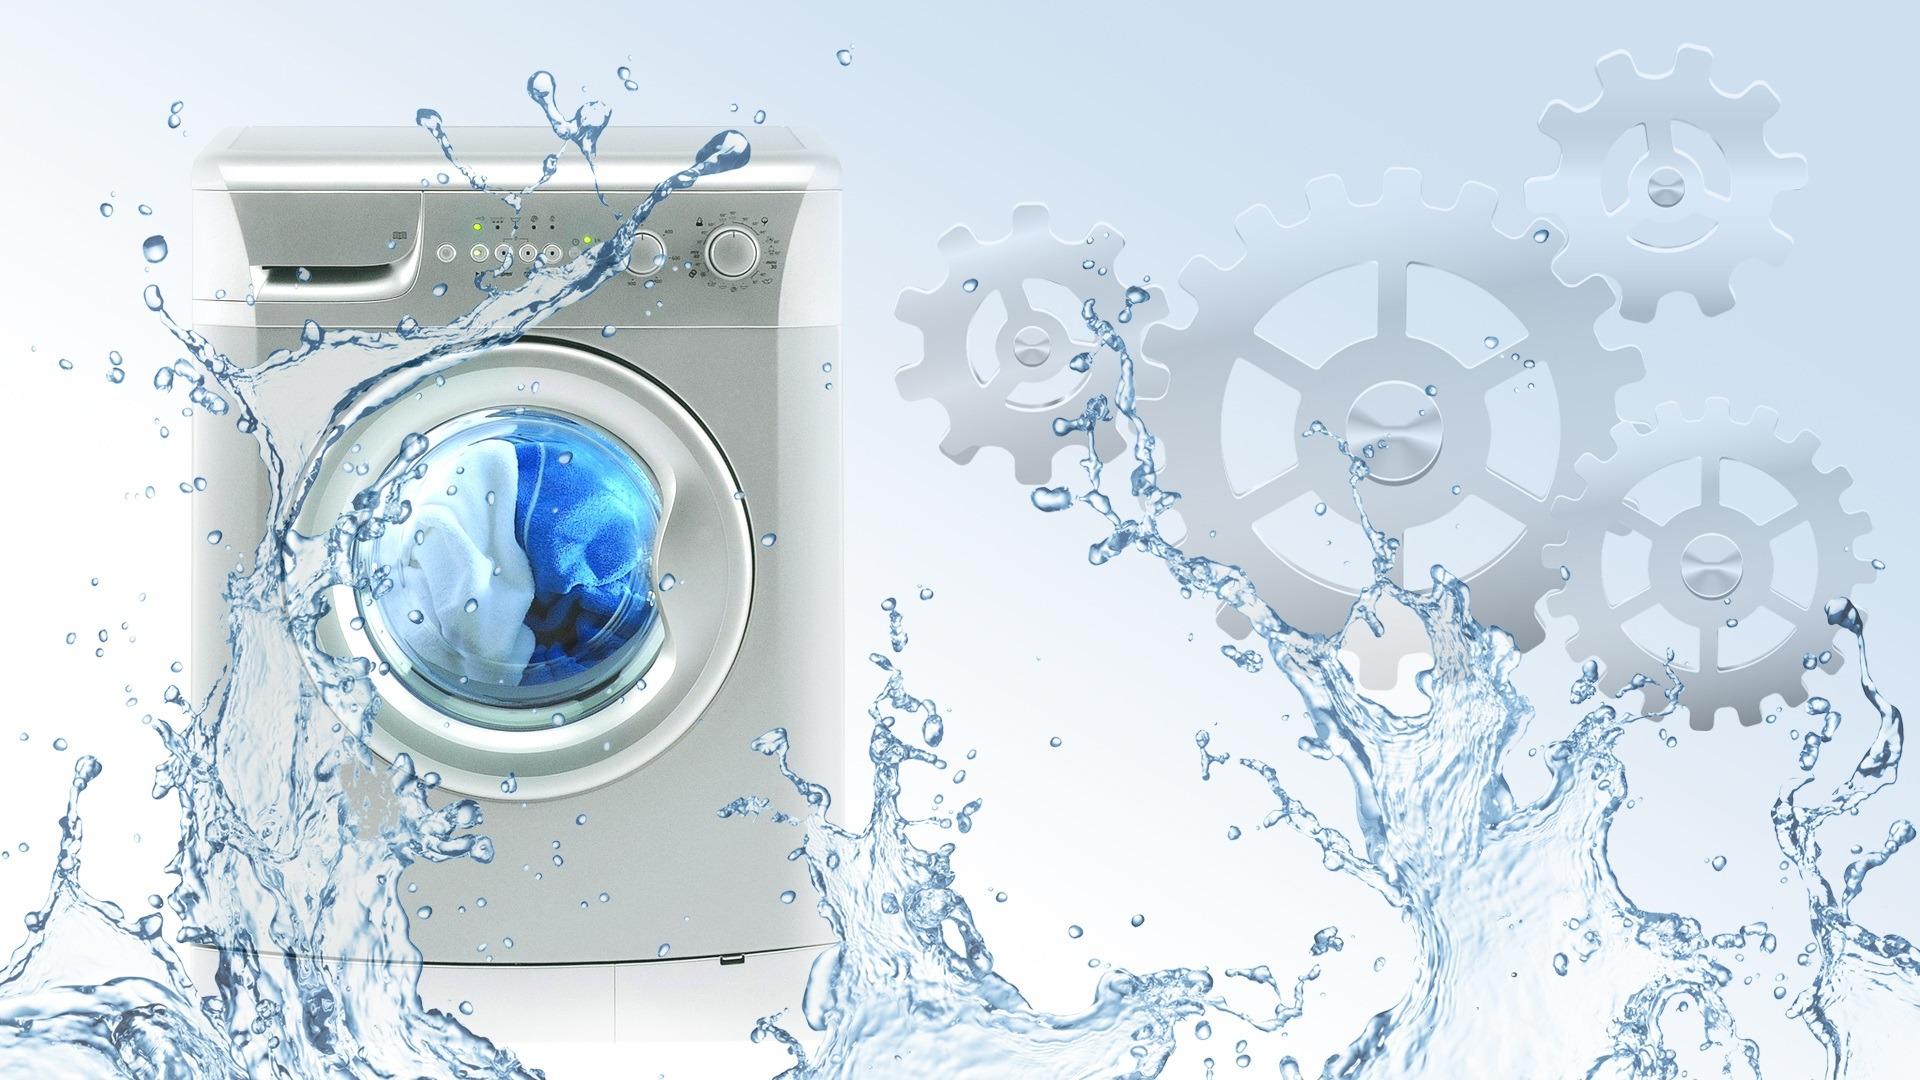 Утечка воды из СМА